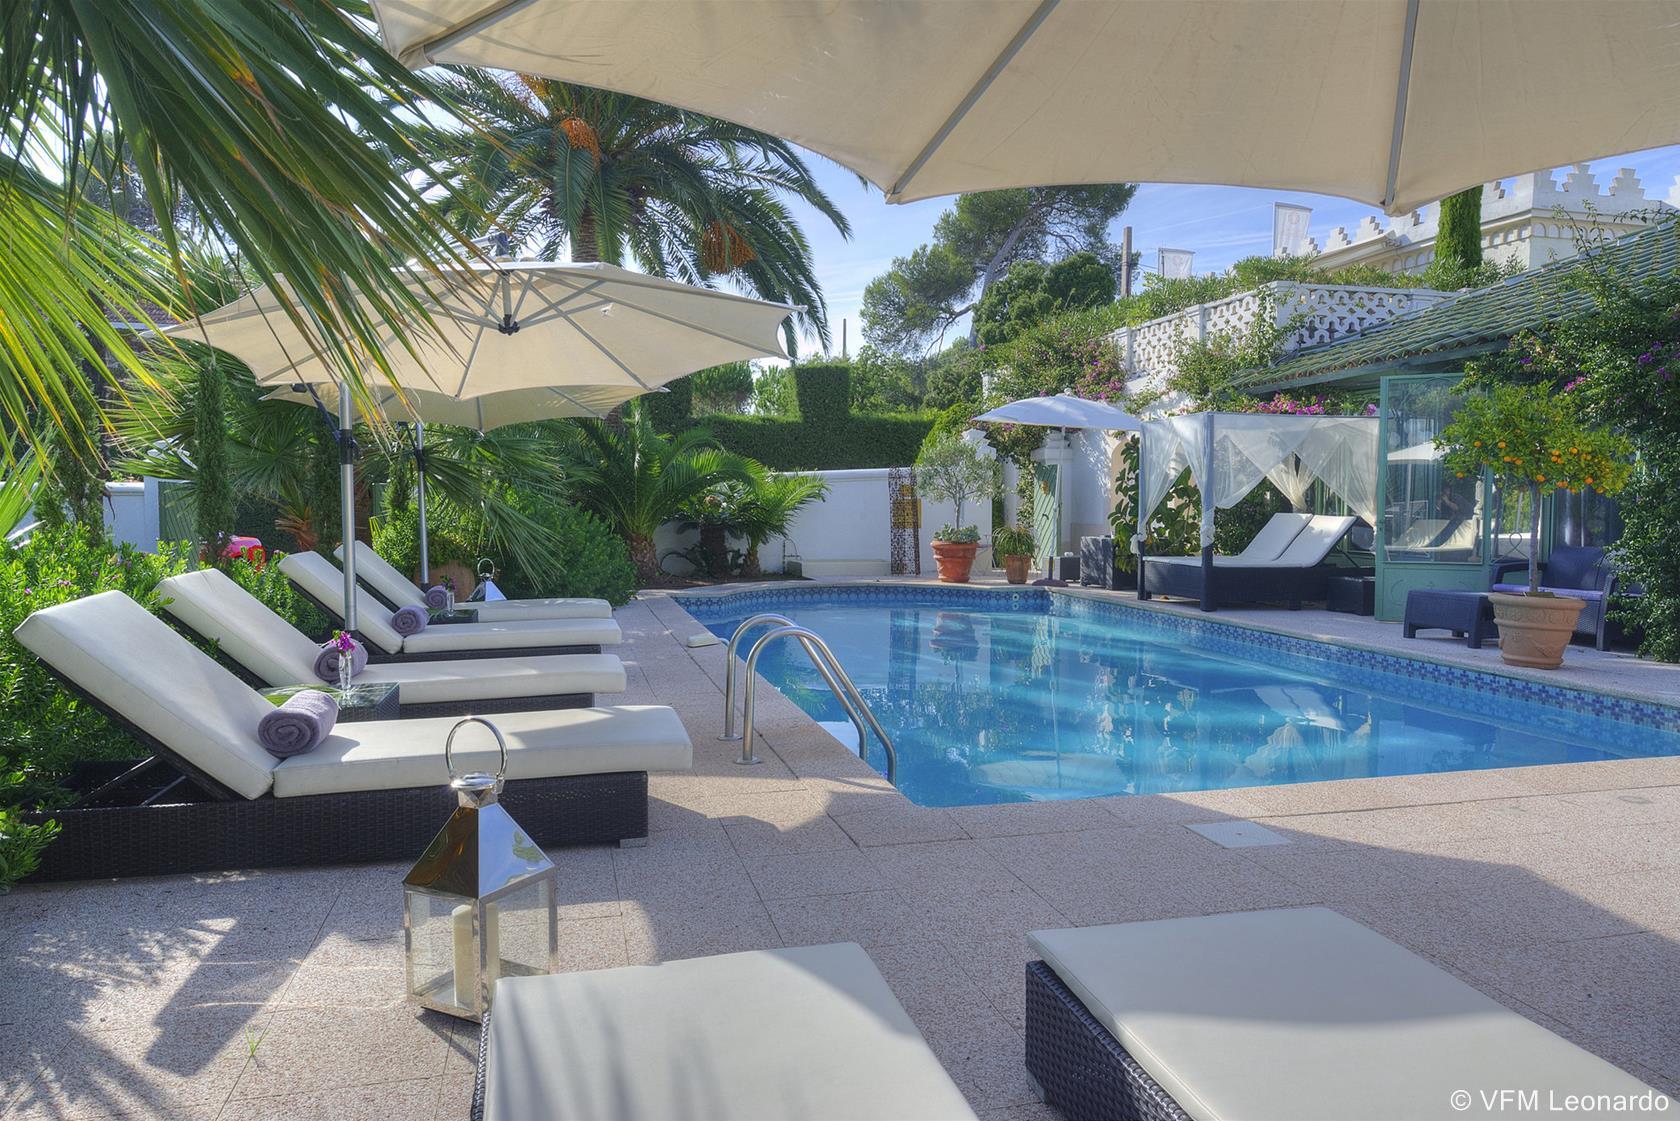 villa bali saint raphael 83 arts et voyages. Black Bedroom Furniture Sets. Home Design Ideas